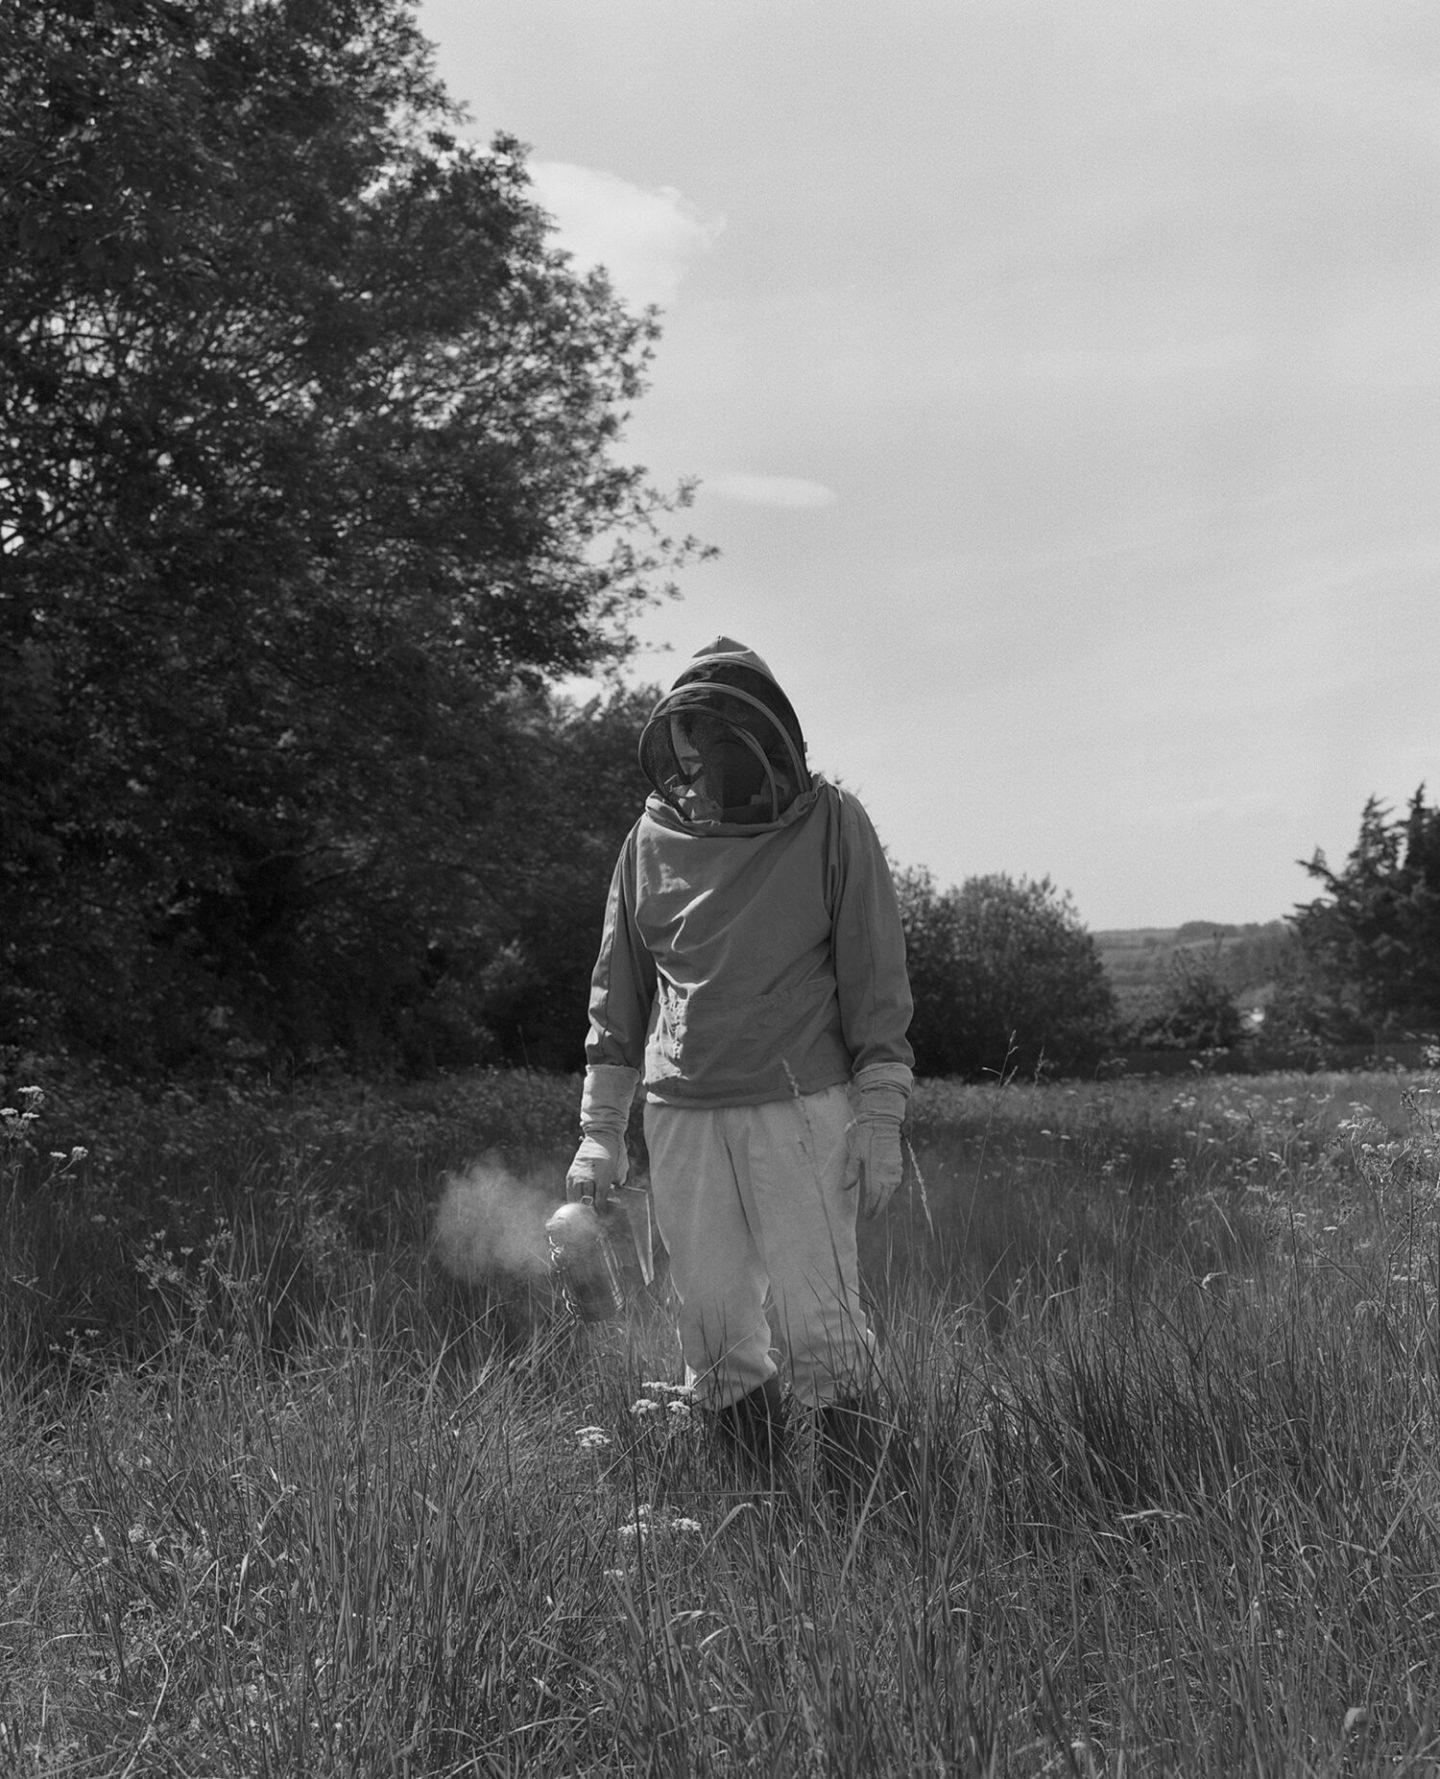 IGNANT-Photography-Sadie-Catt-Beekeeper-04